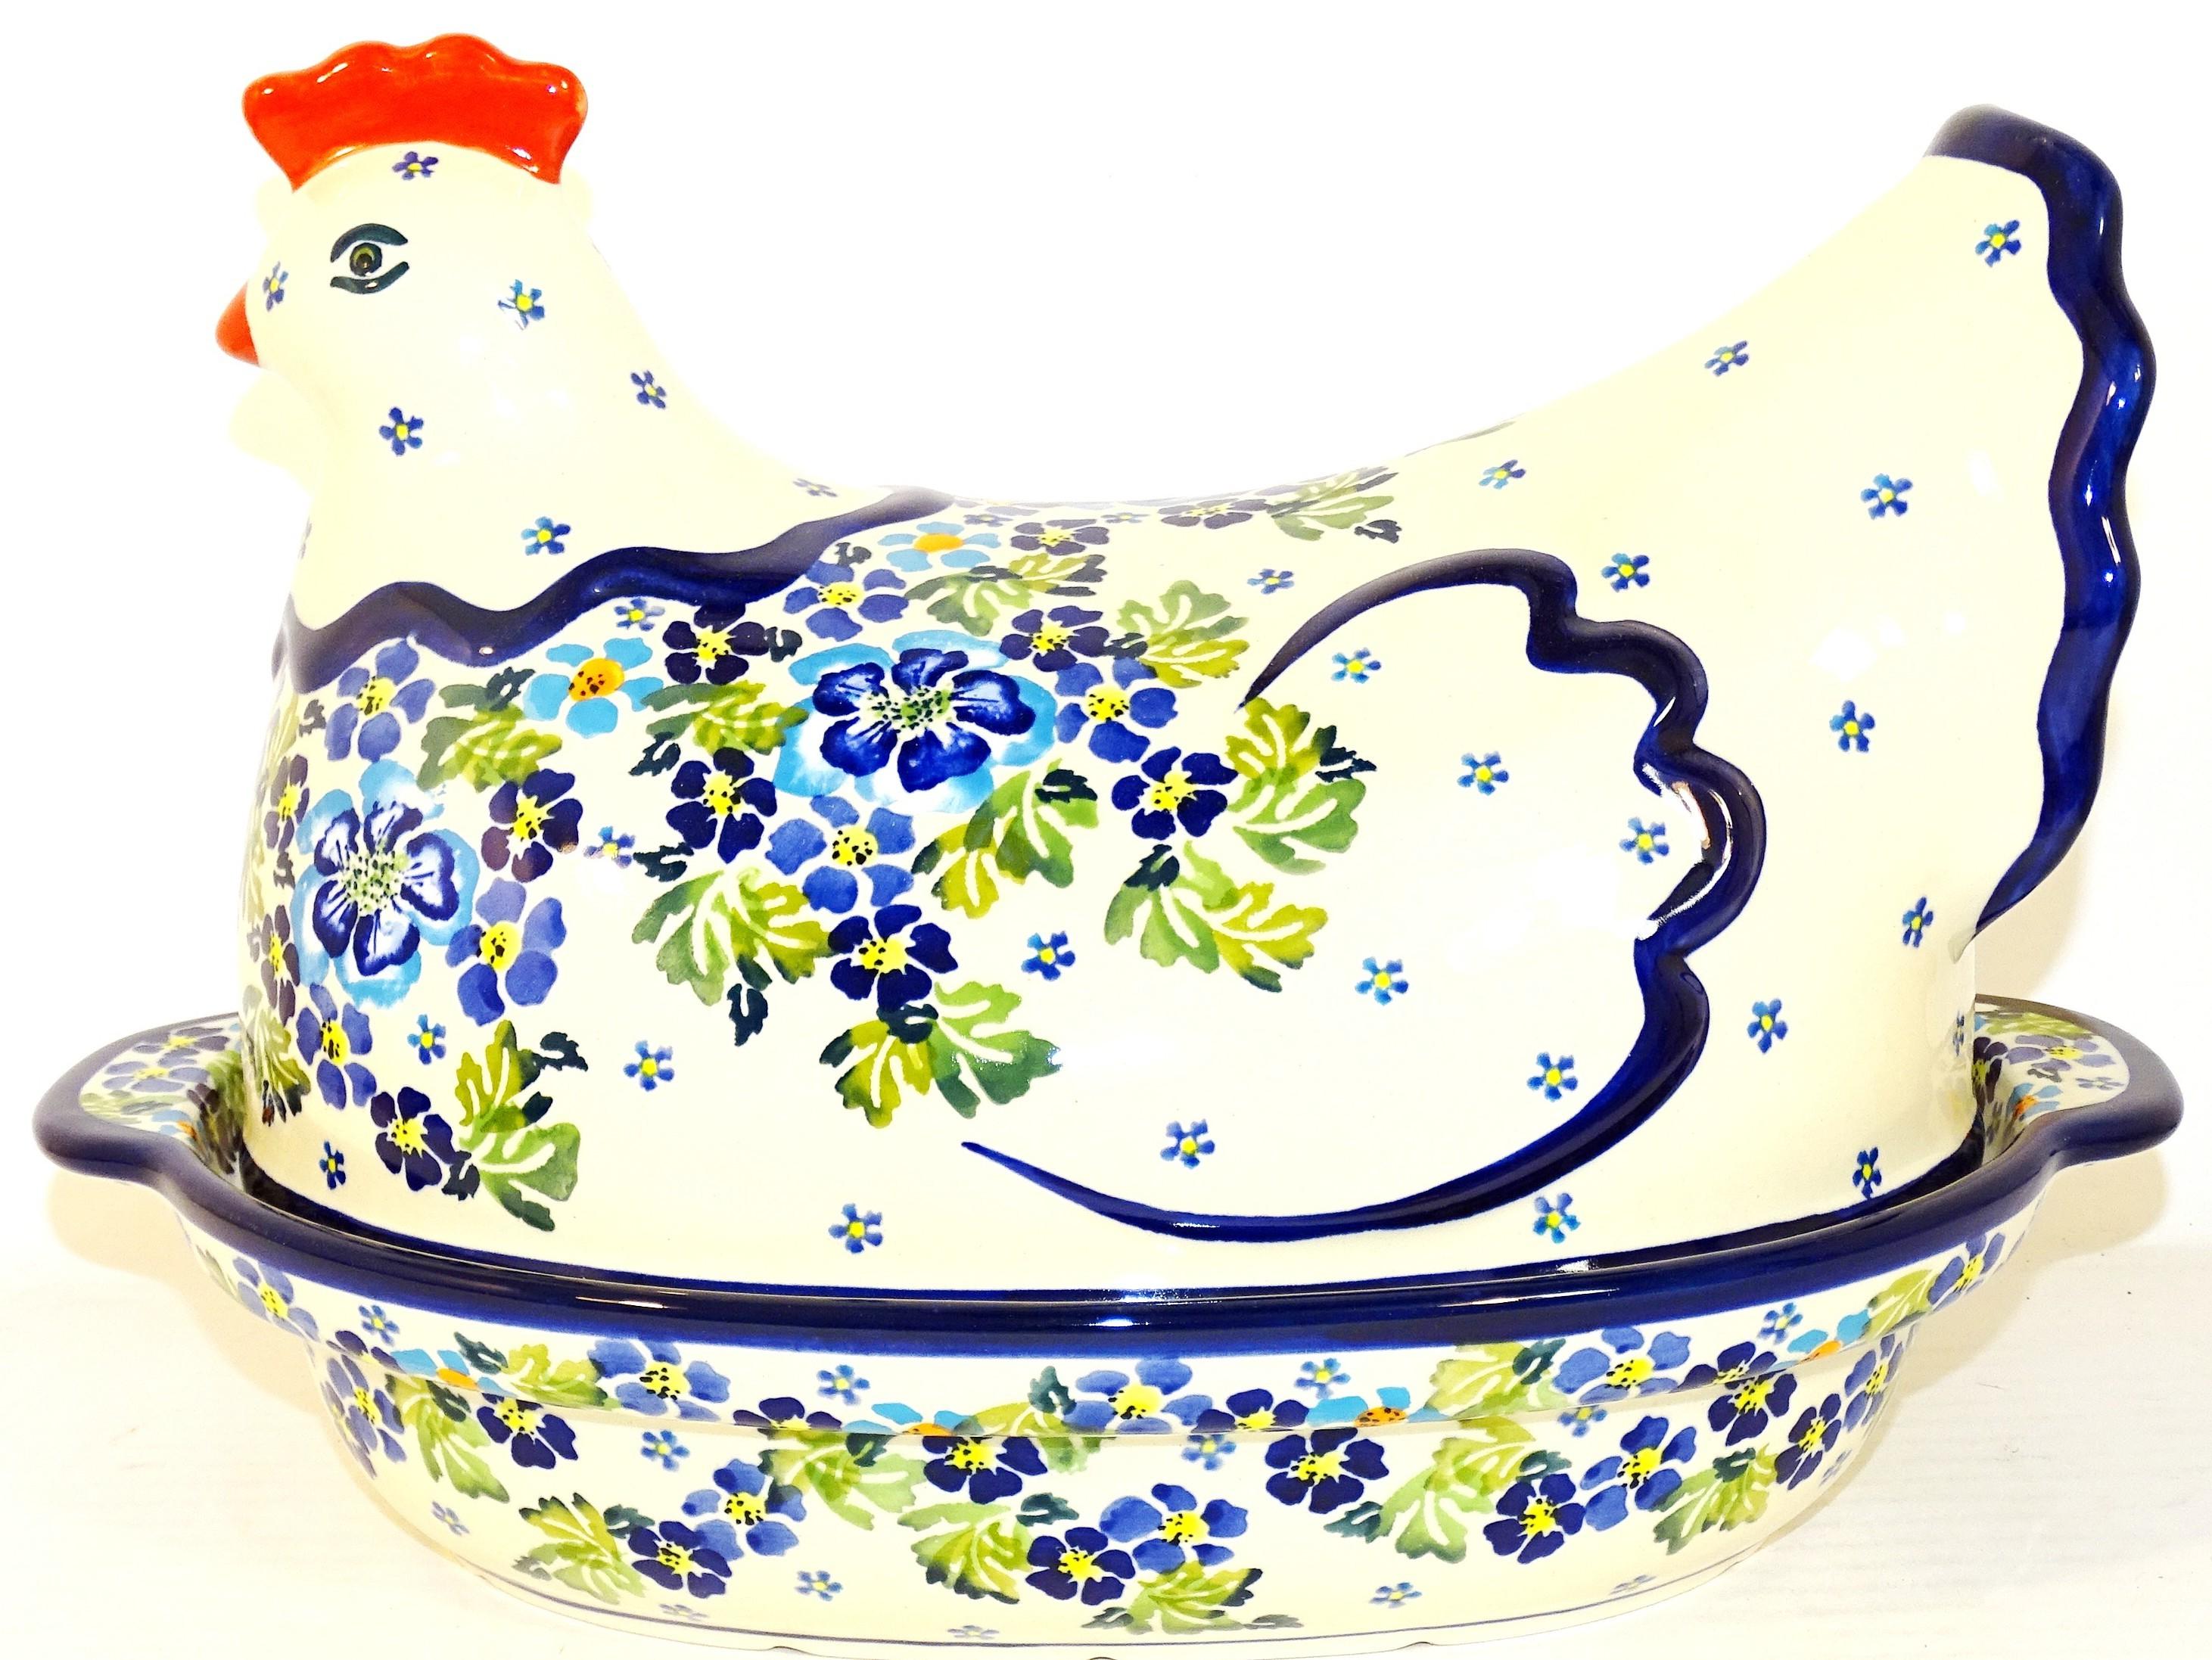 Pottery Avenue 1.5L Hen Casserole Baker | ARTISAN